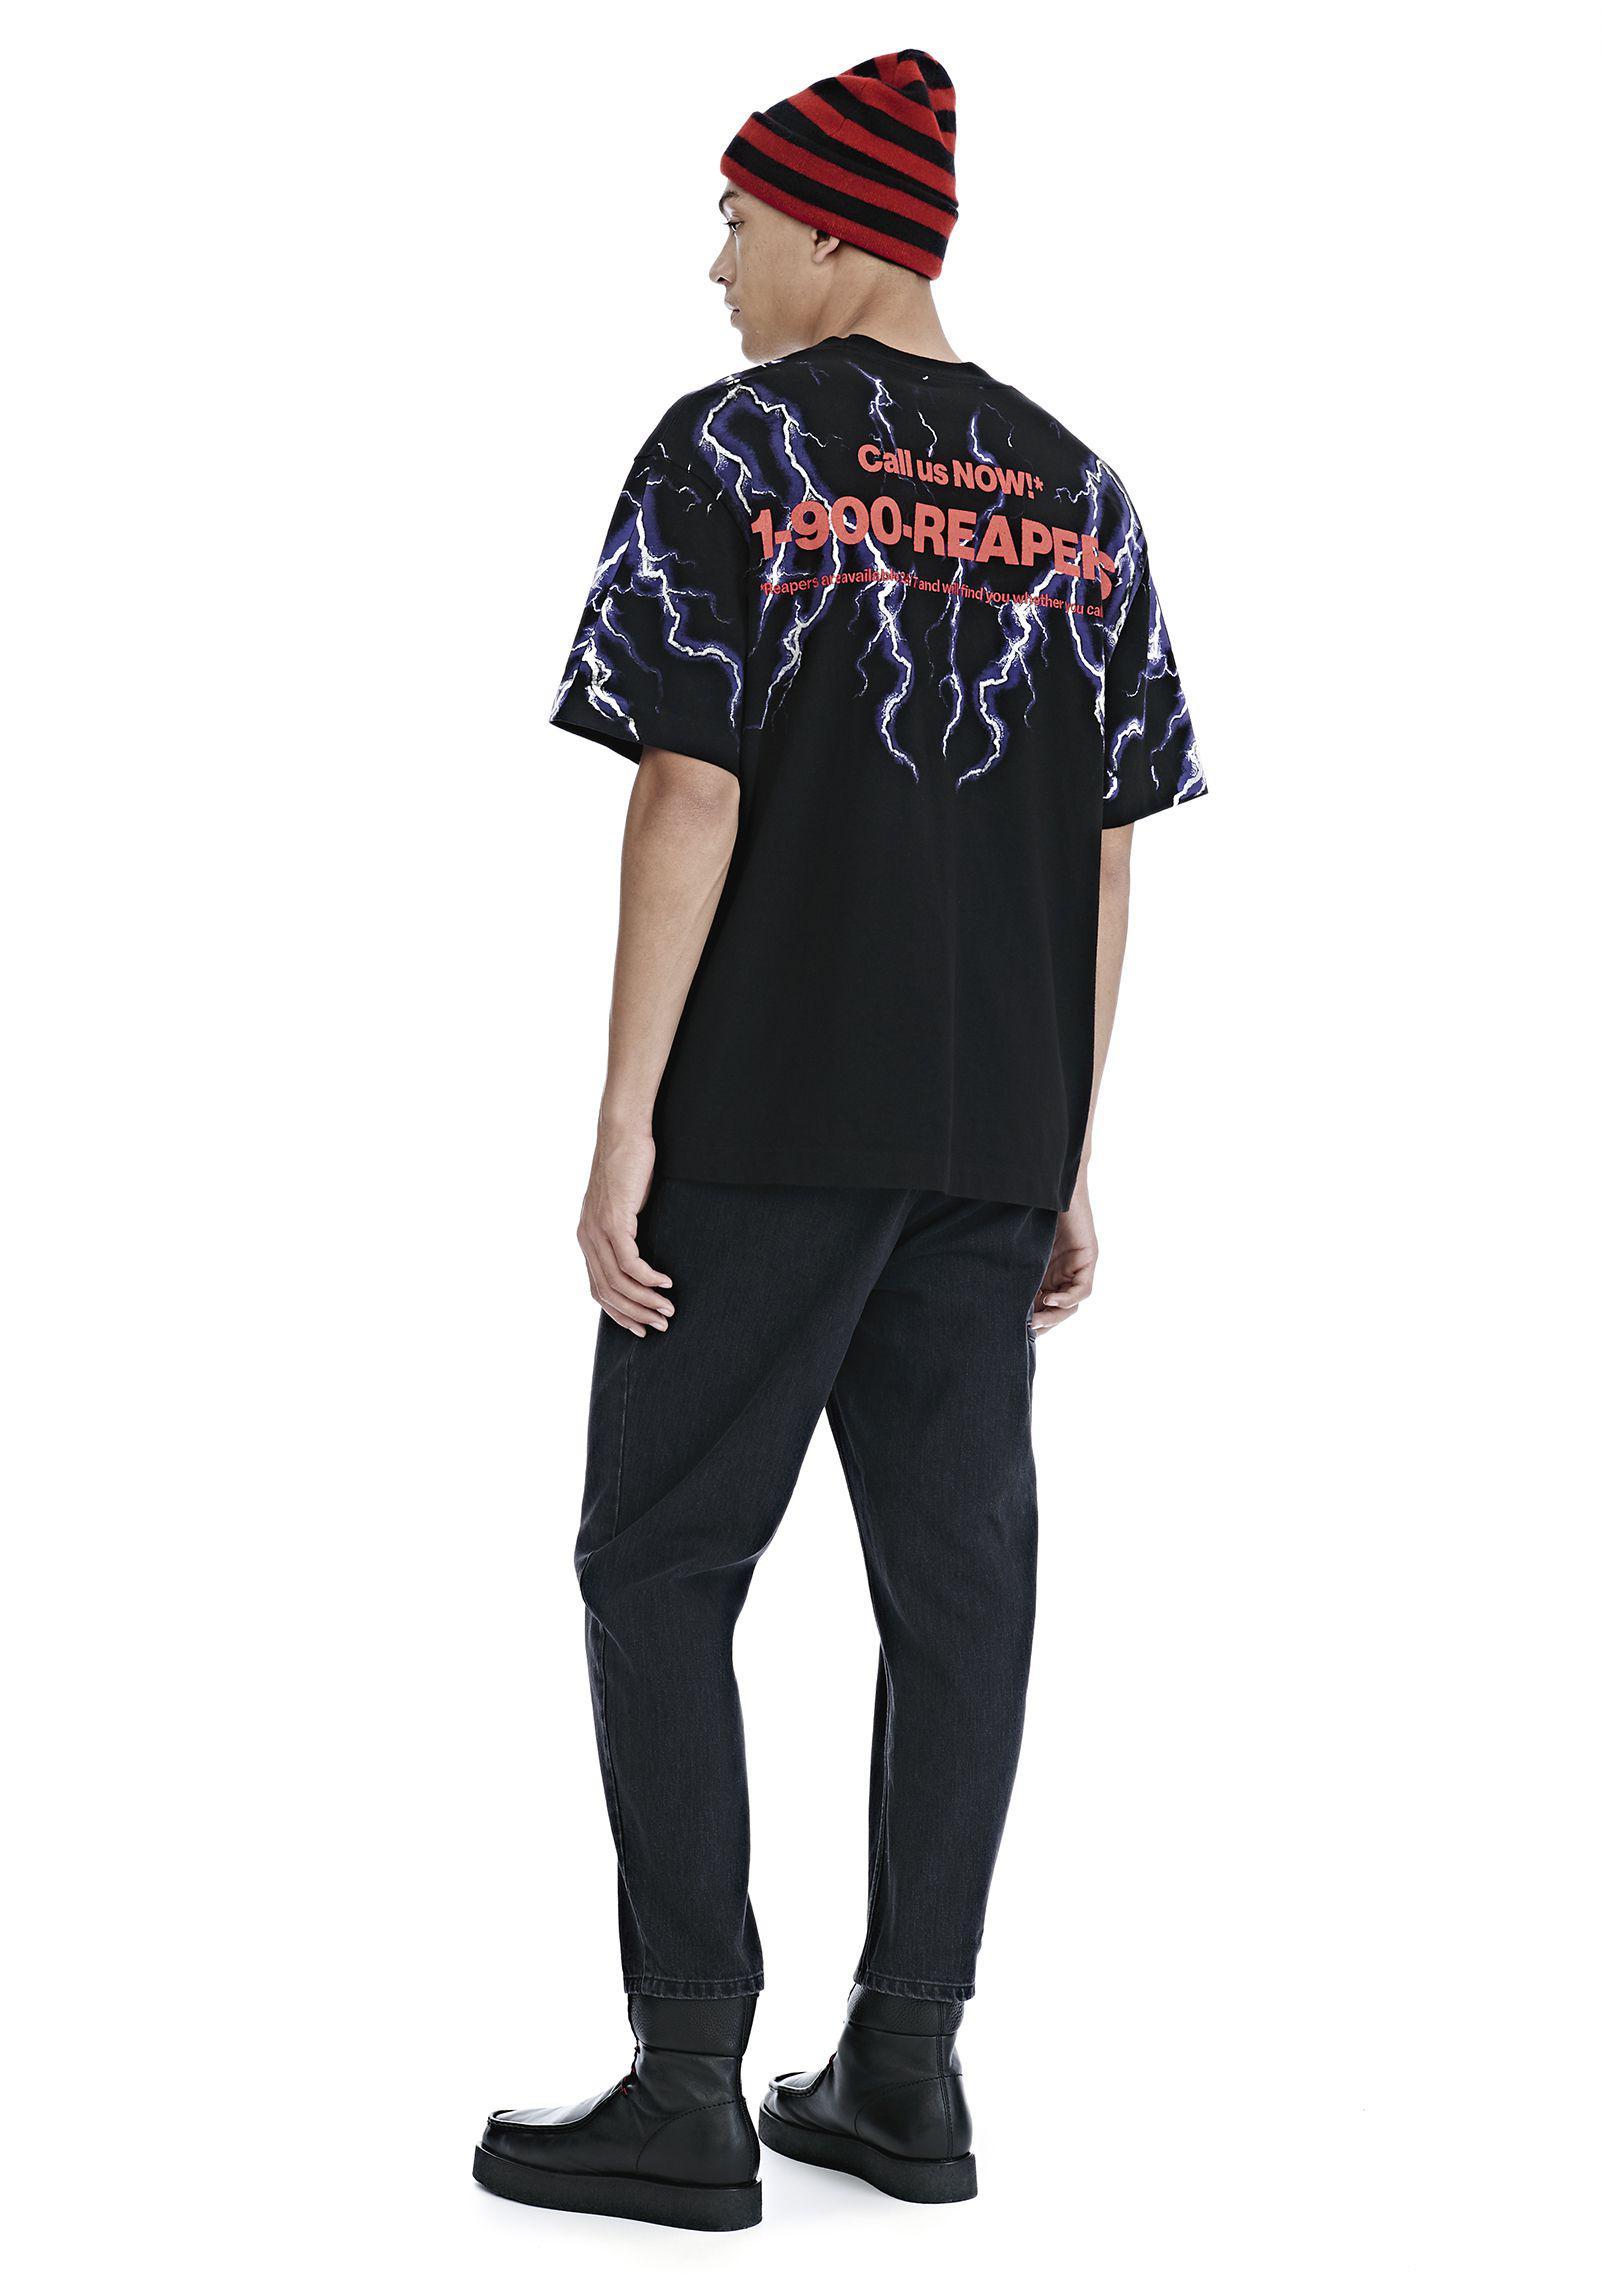 dd5c75ff Alexander Wang Lightning Collage Short Sleeve Tee in Black for Men ...